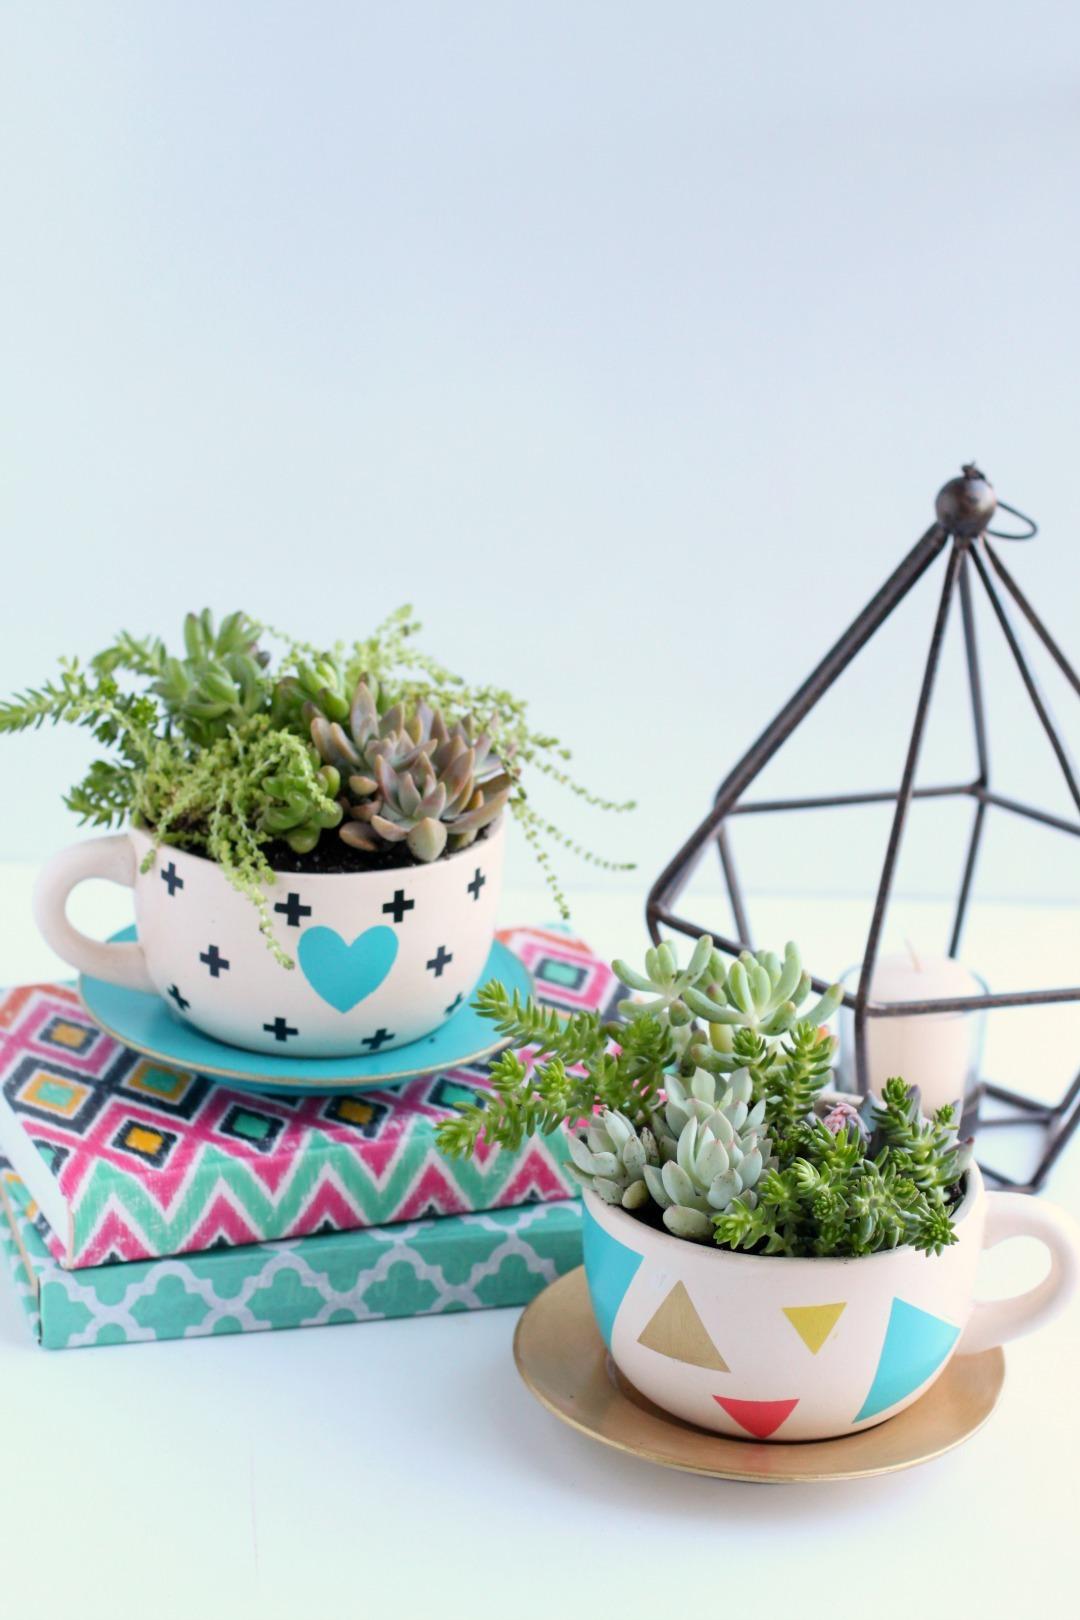 DIY Succulent Teat Cup Planter